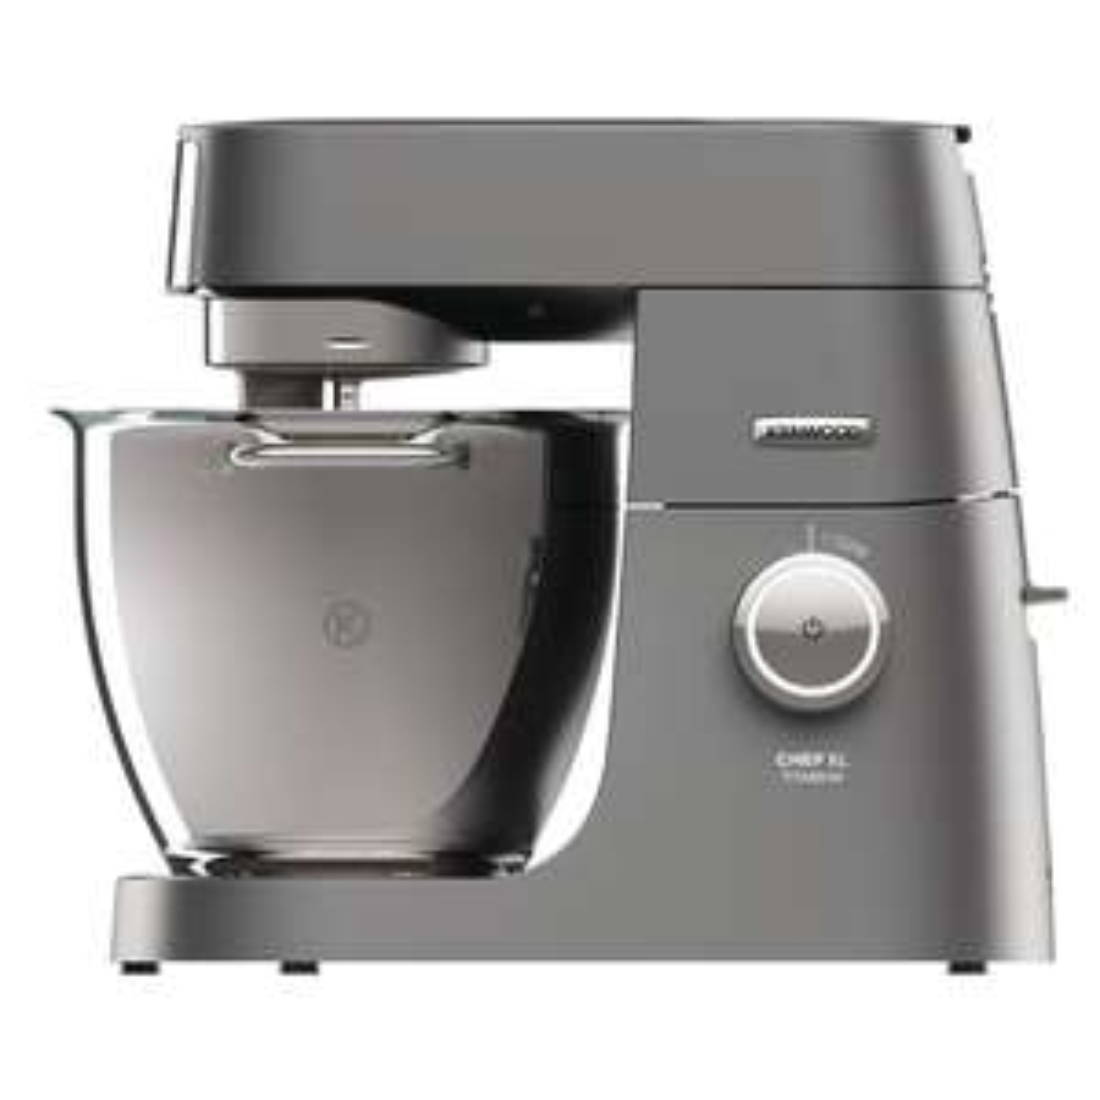 Kenwood KVL8300S mixer - smashing the black friday deals - £339.79 @ Nisbets